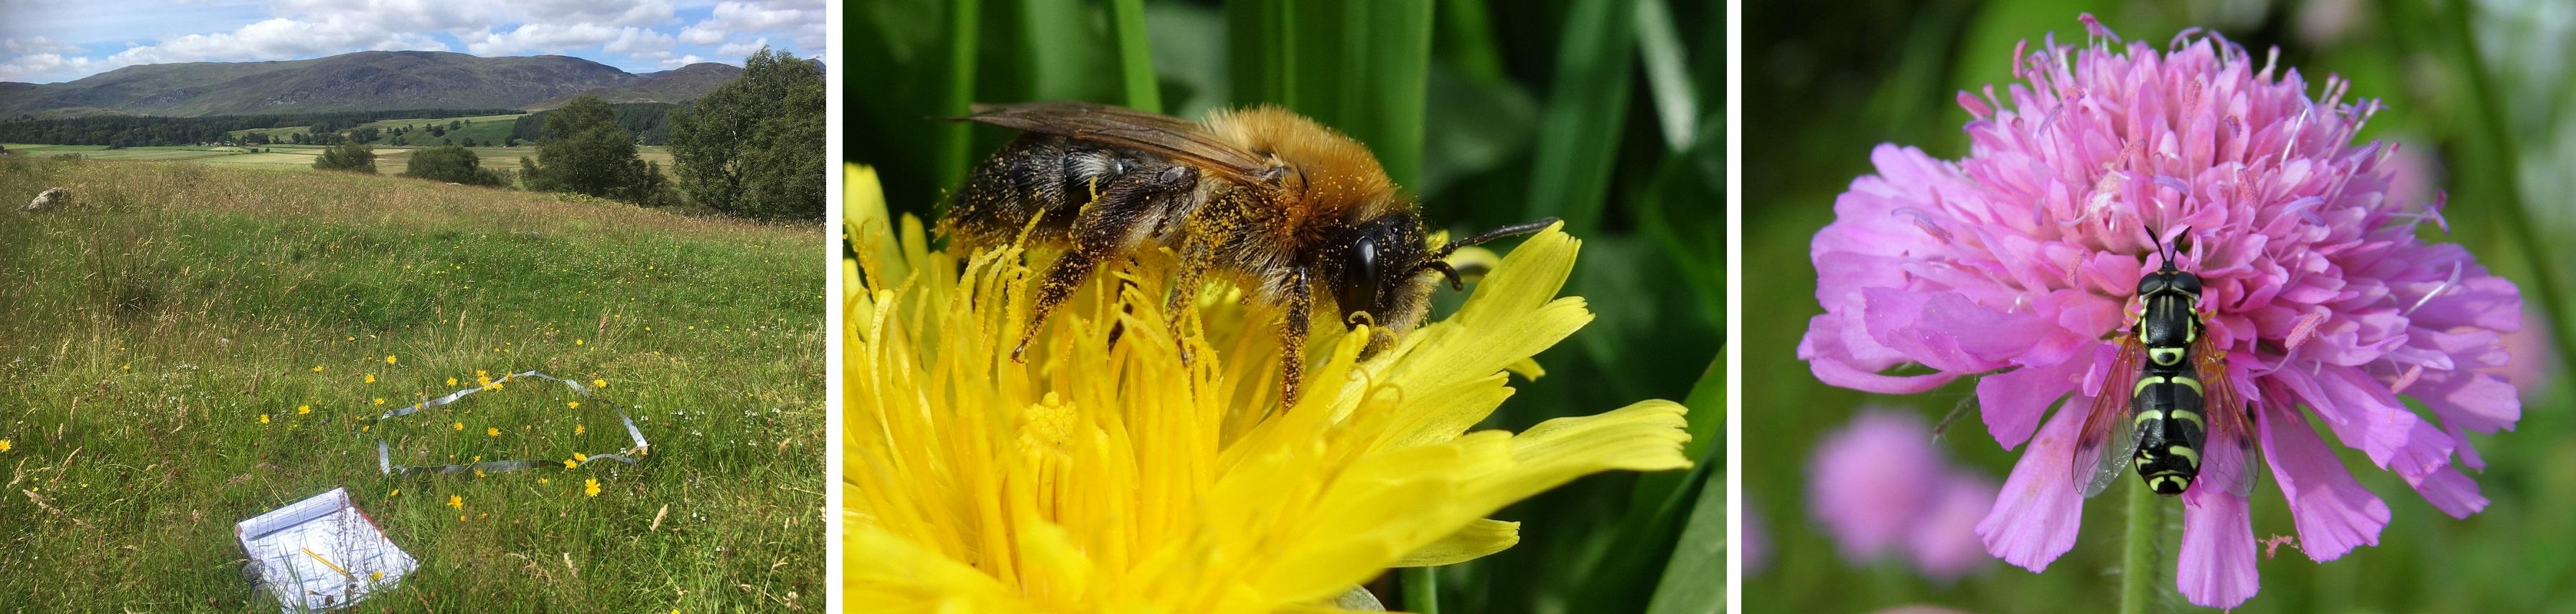 Pollinator images